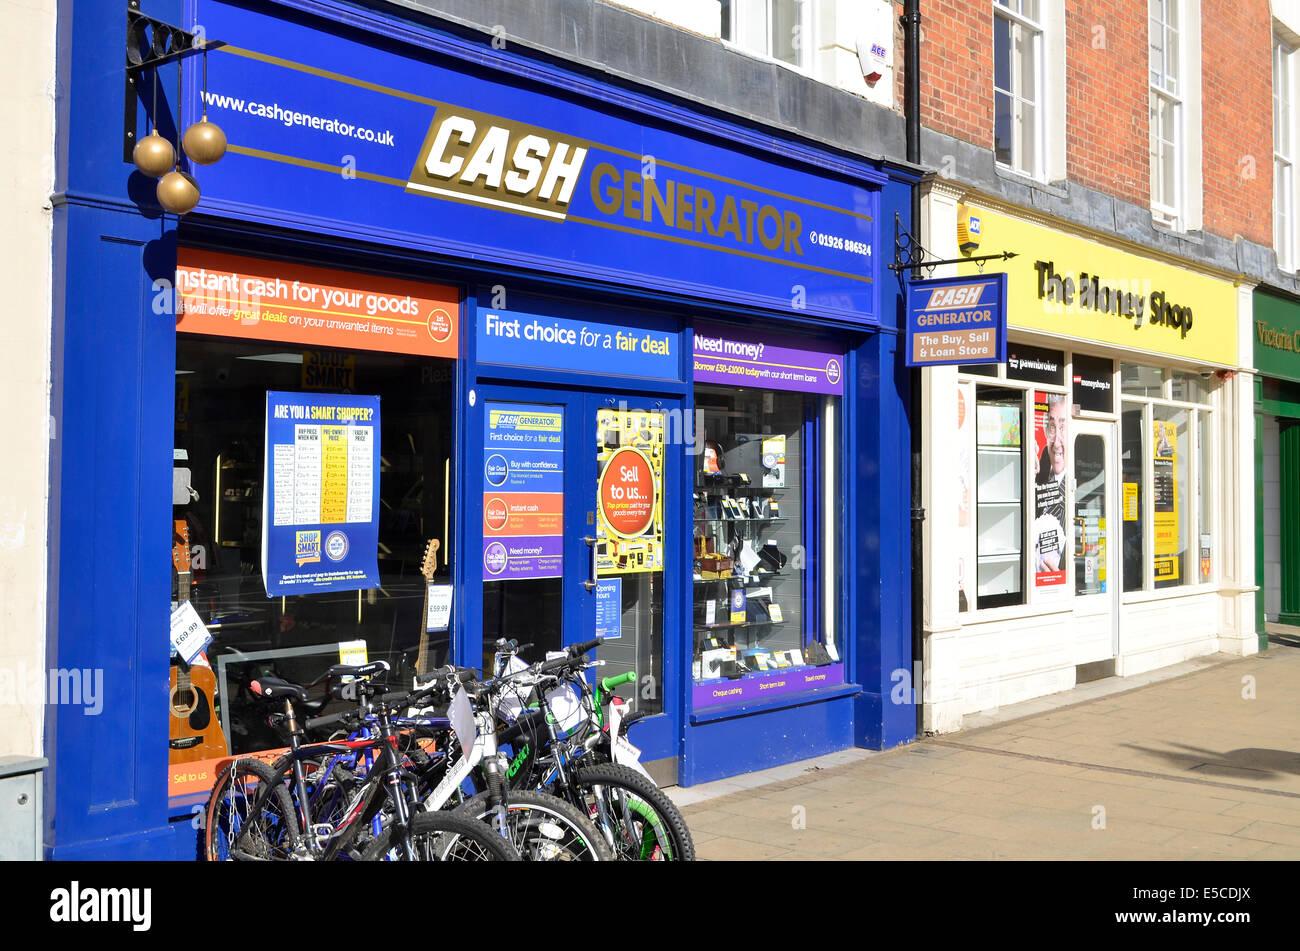 Cash loans for blacklisted clients image 5